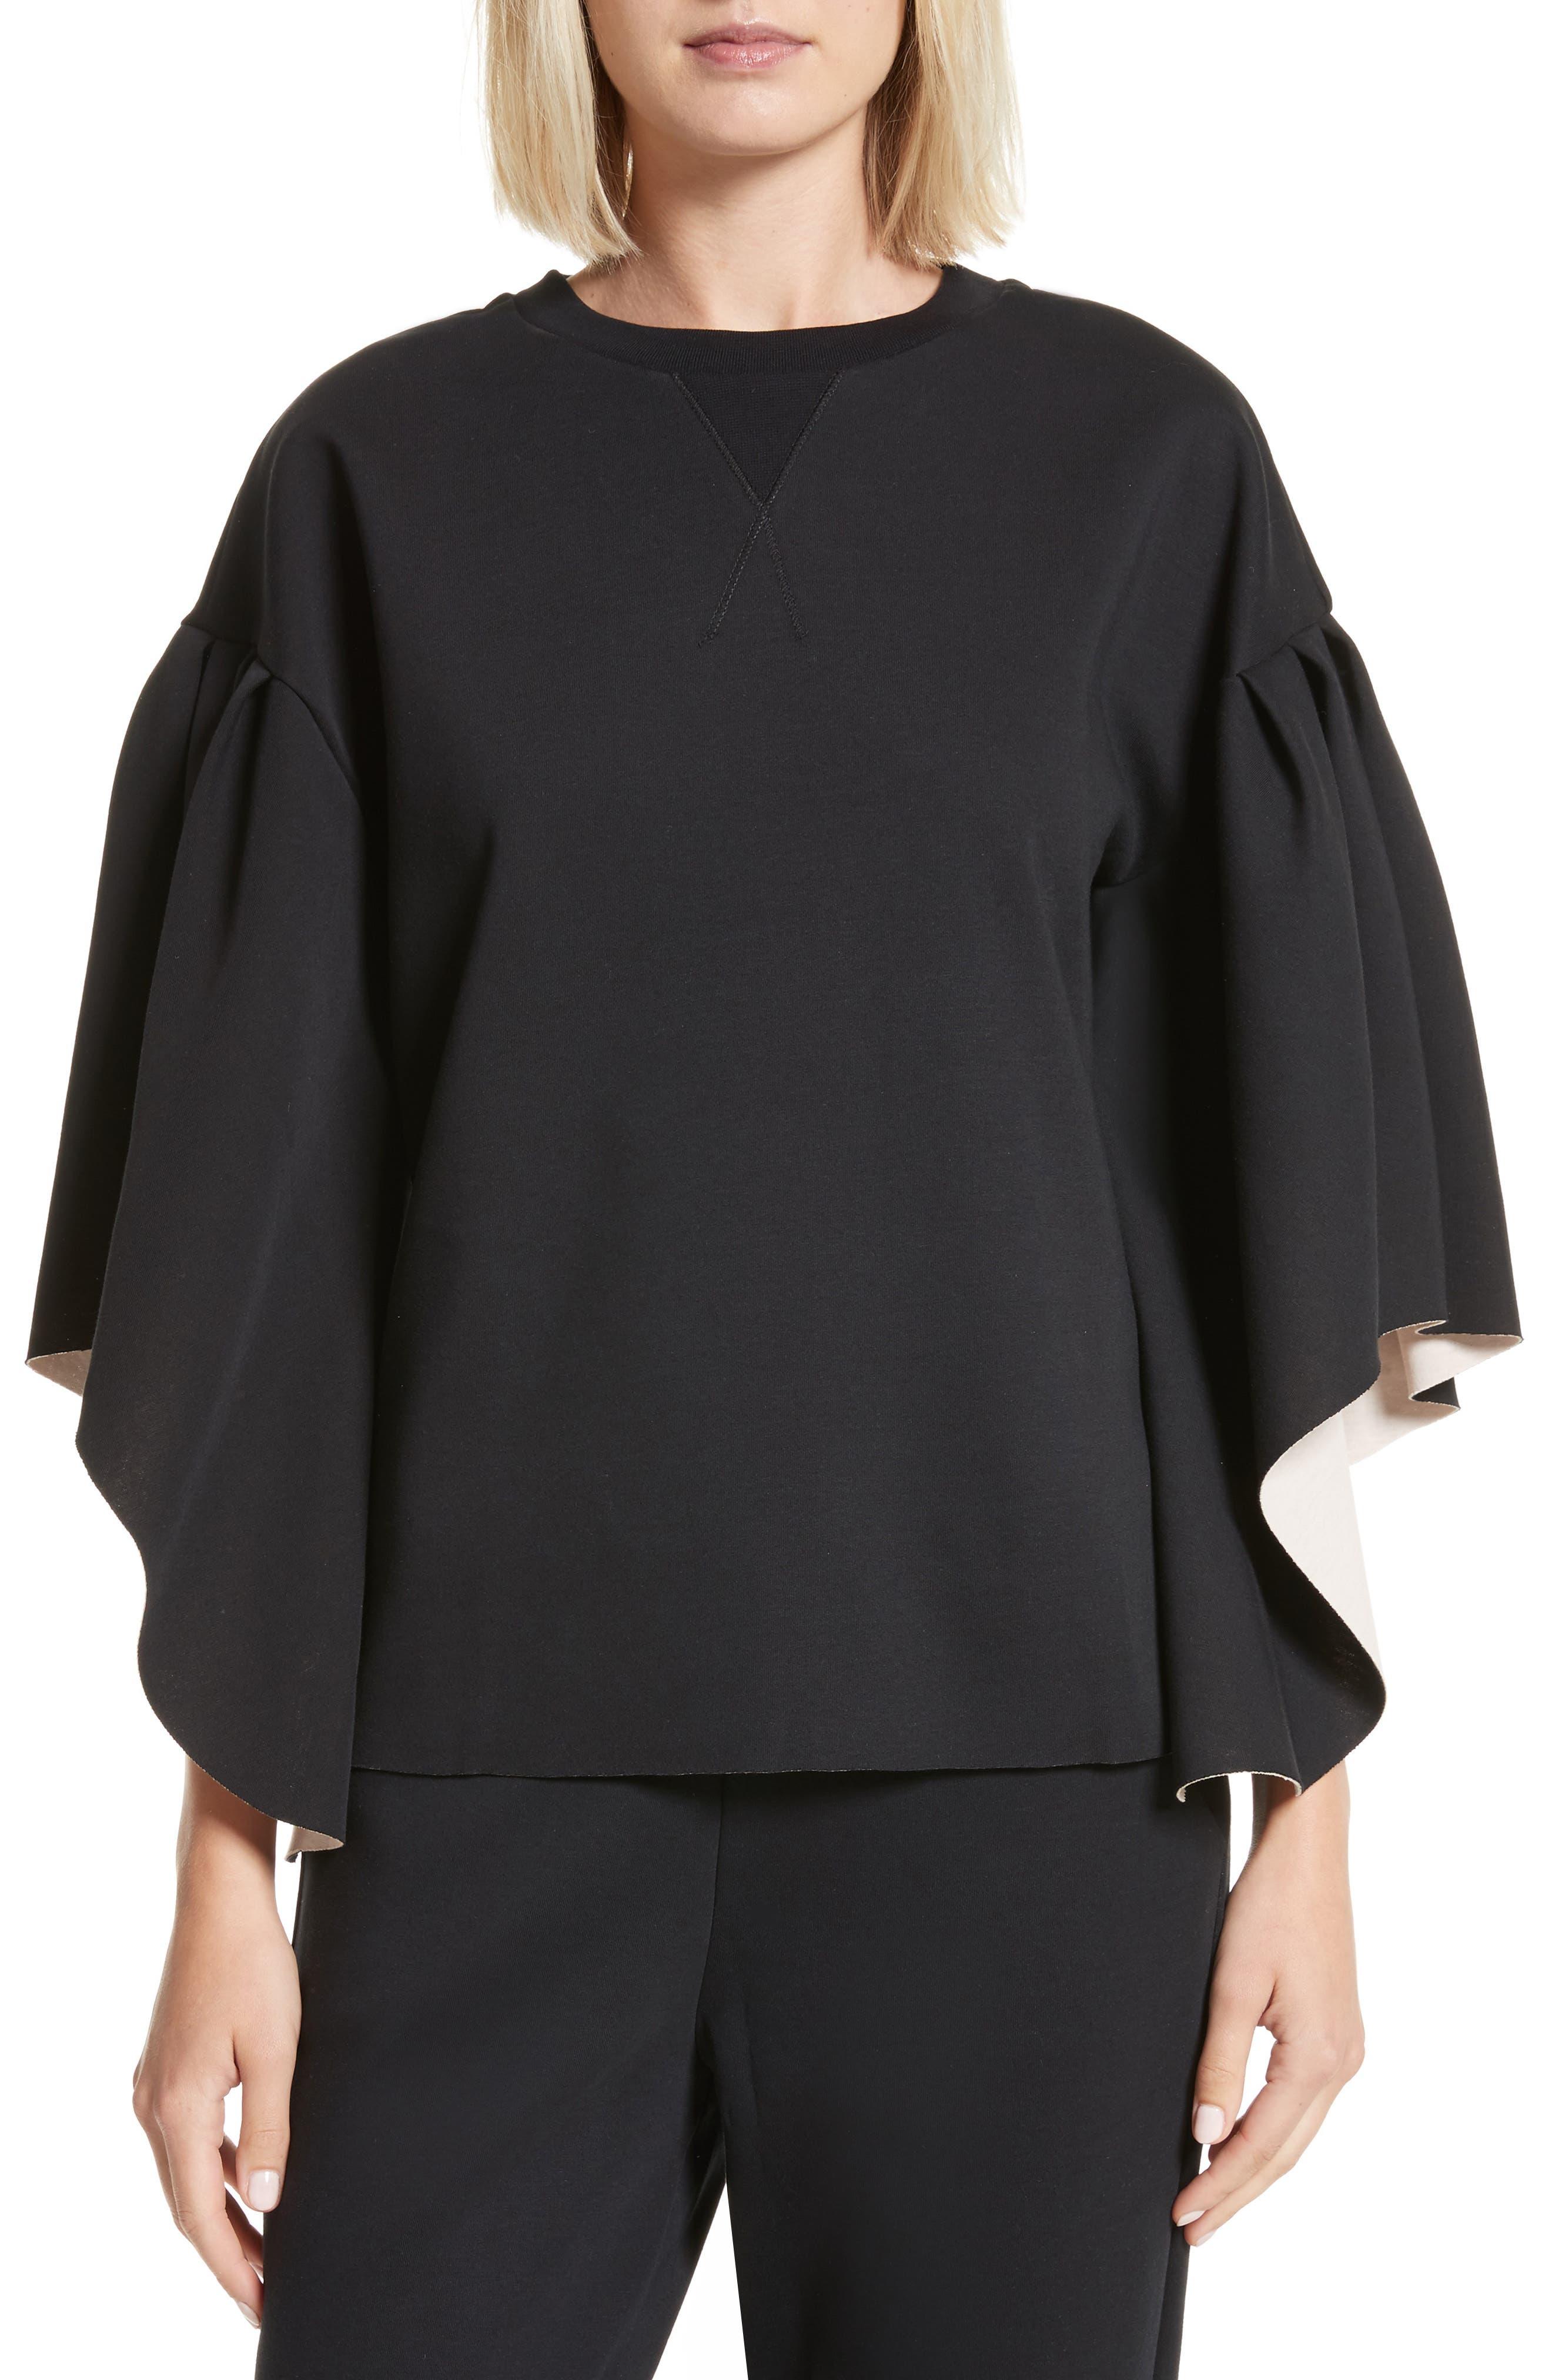 Orcher Full Sleeve Sweatshirt,                             Main thumbnail 1, color,                             001